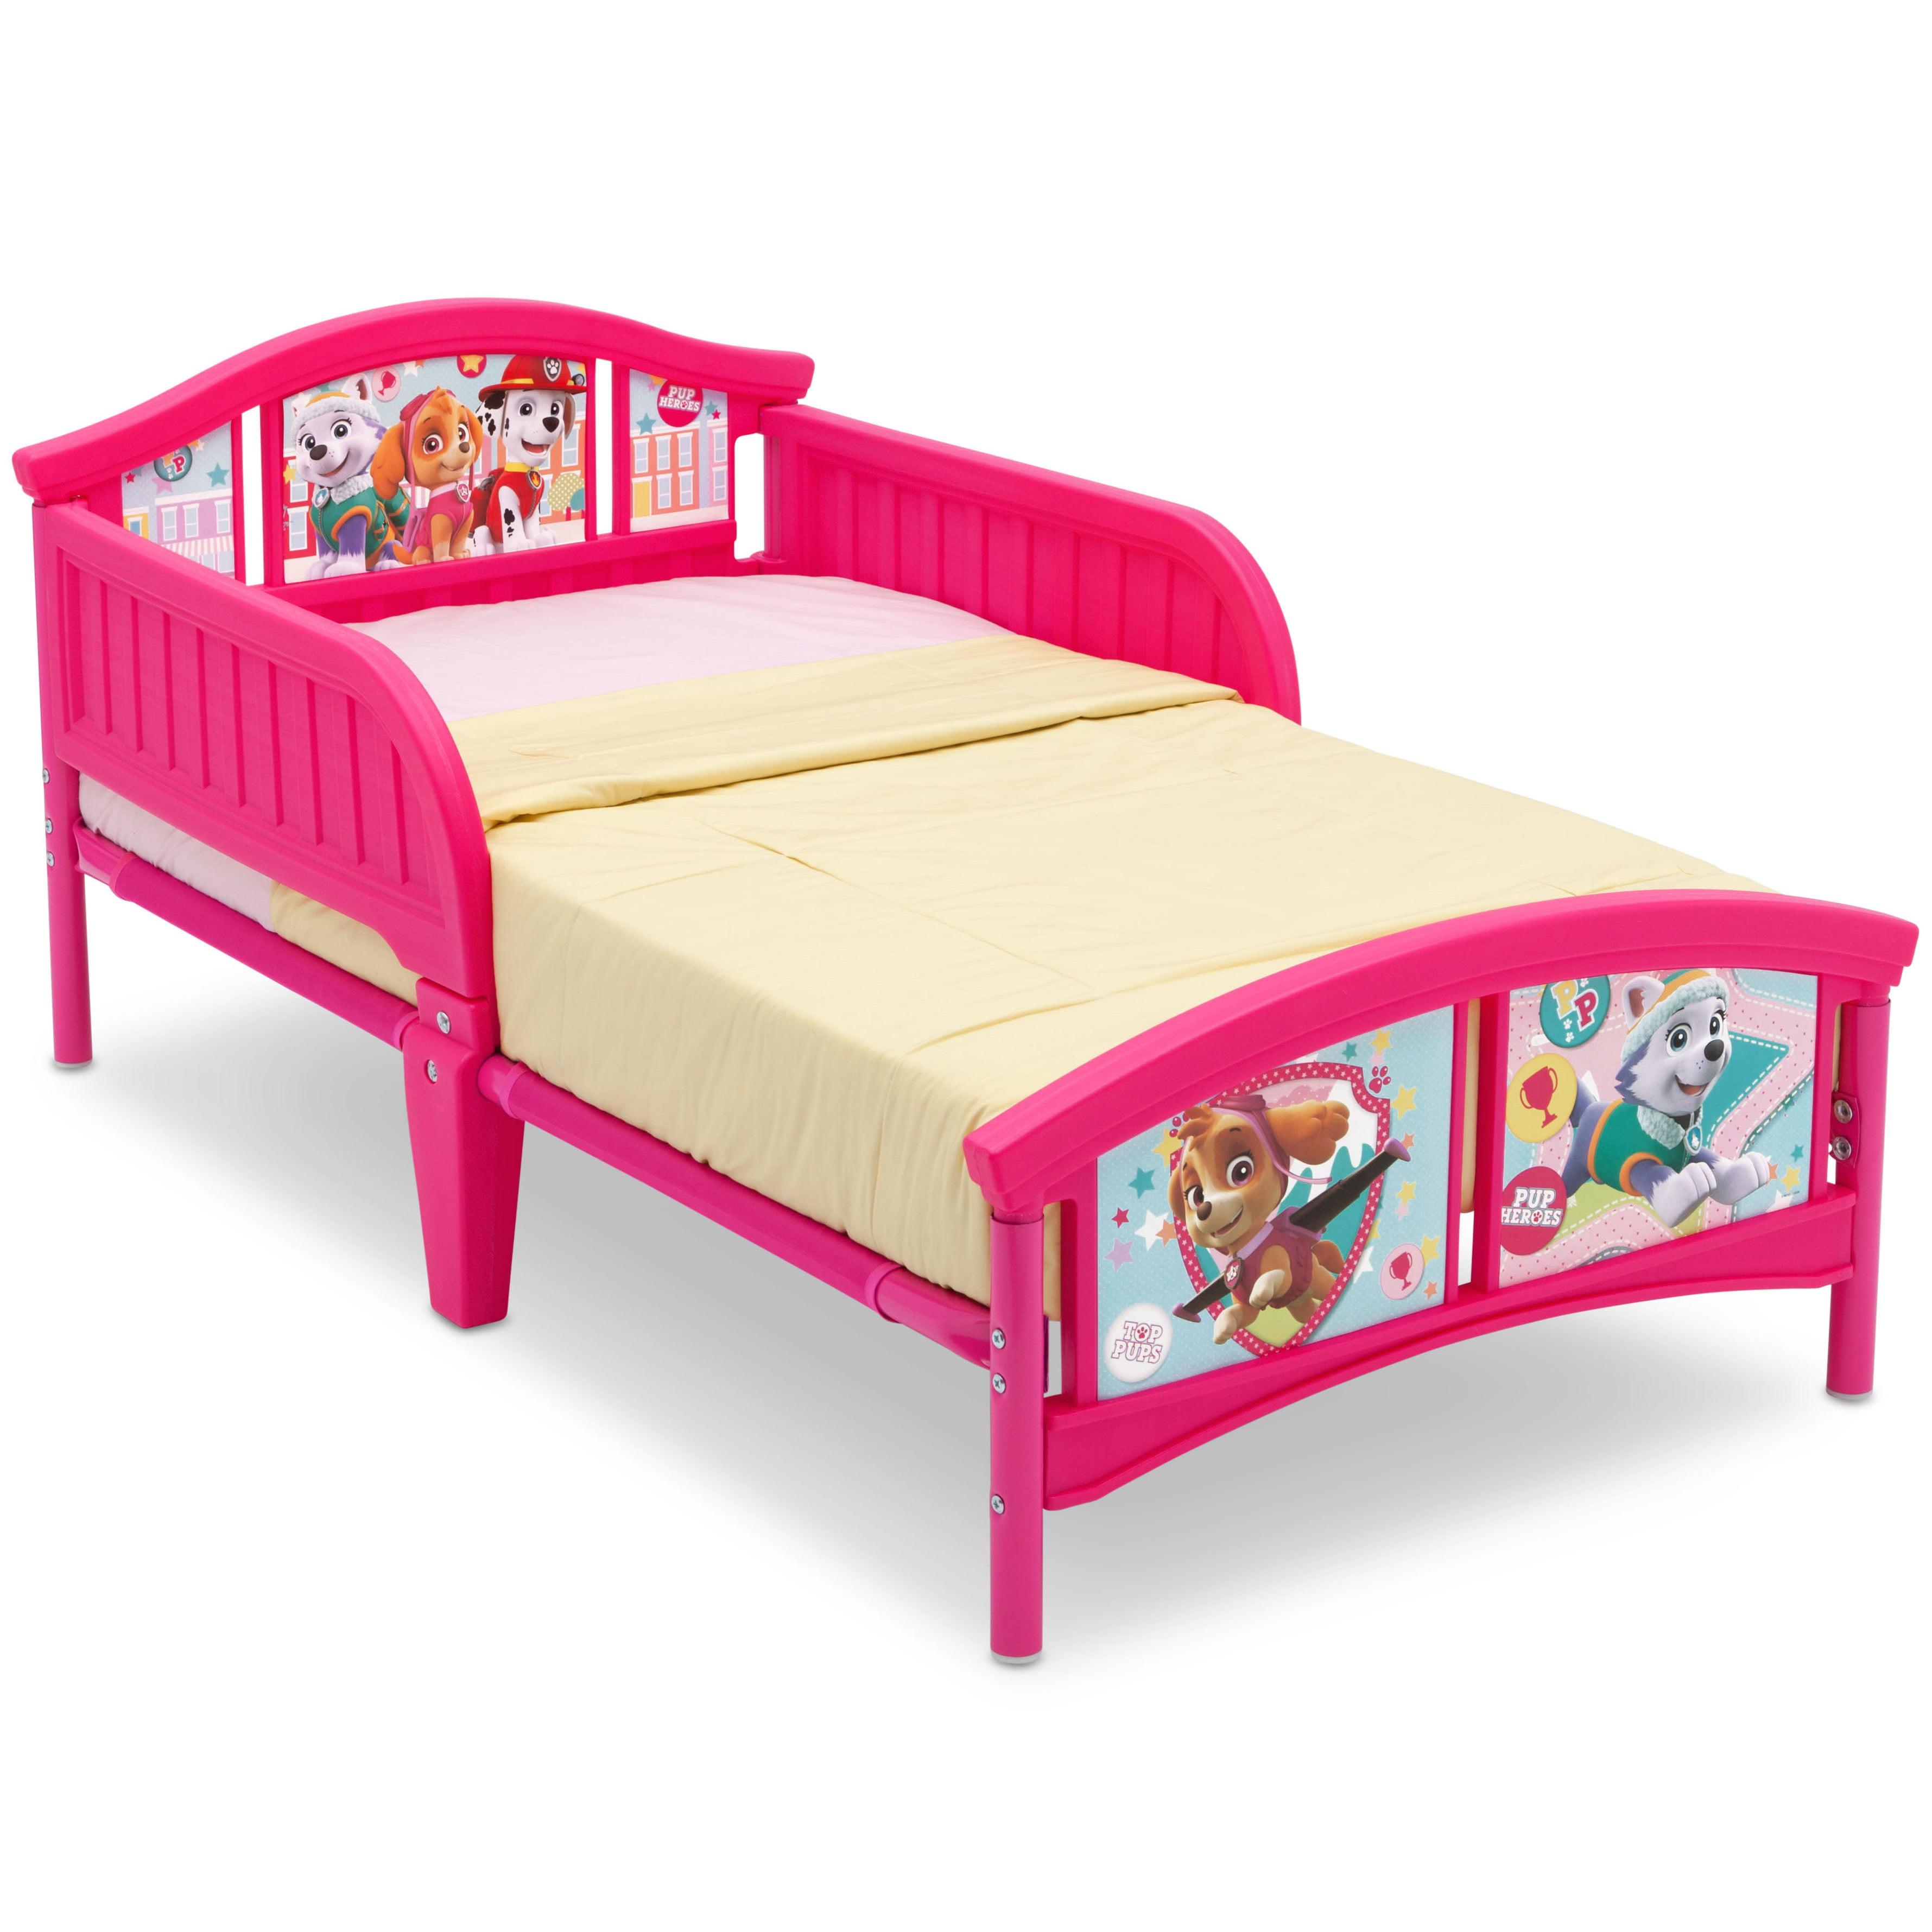 Paw Patrol Skye & Everest Plastic Toddler Bed